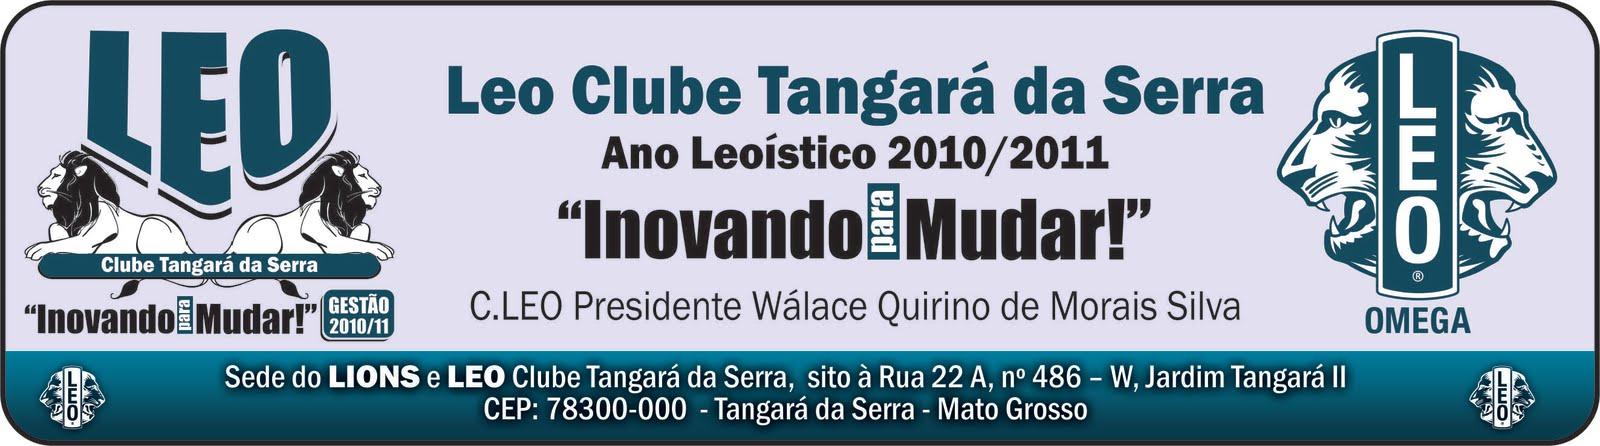 LEO Clube Tangará da Serra